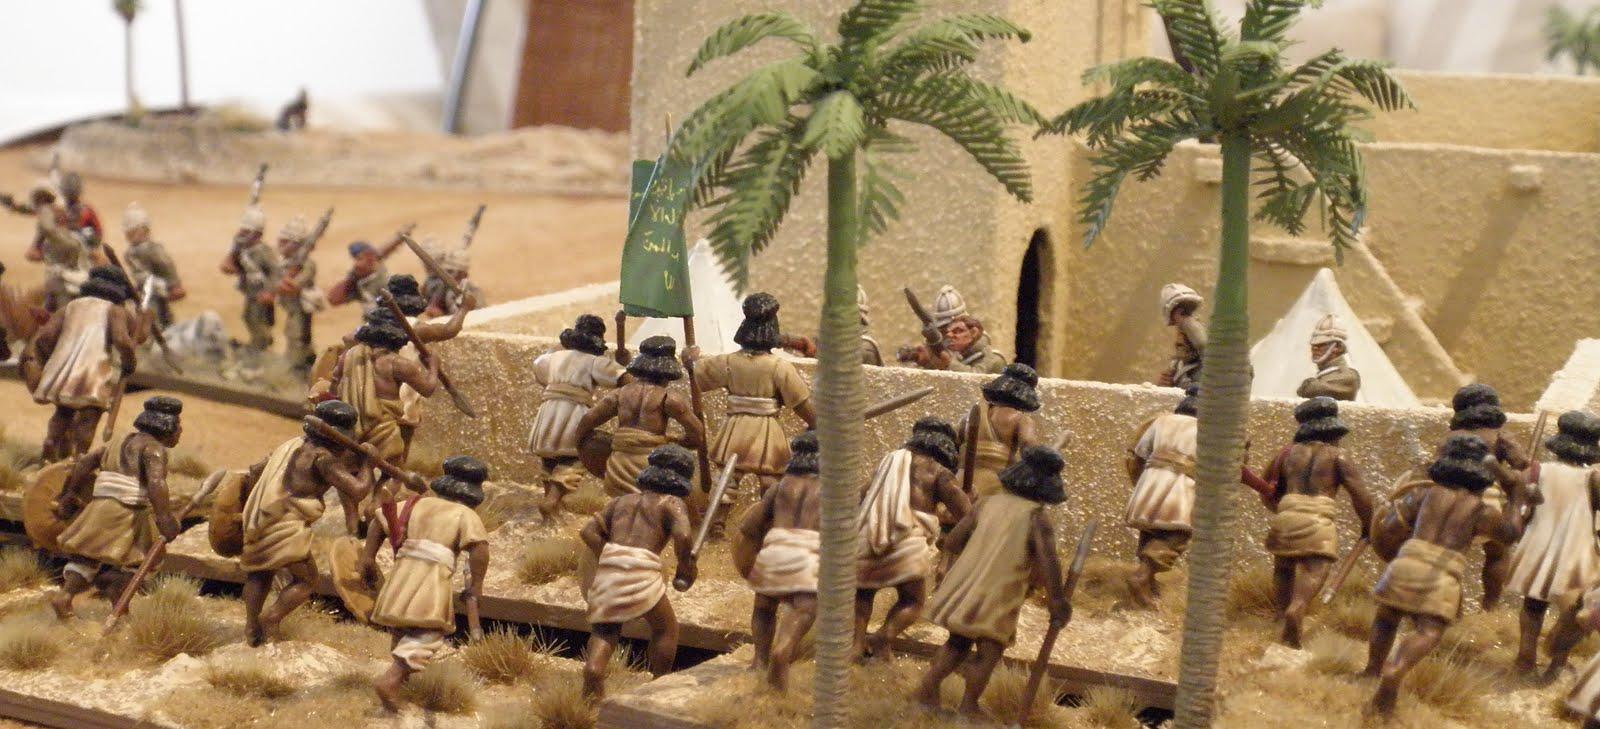 Mahdi Army : Lonely gamers clearing the nile of mahdi sudan